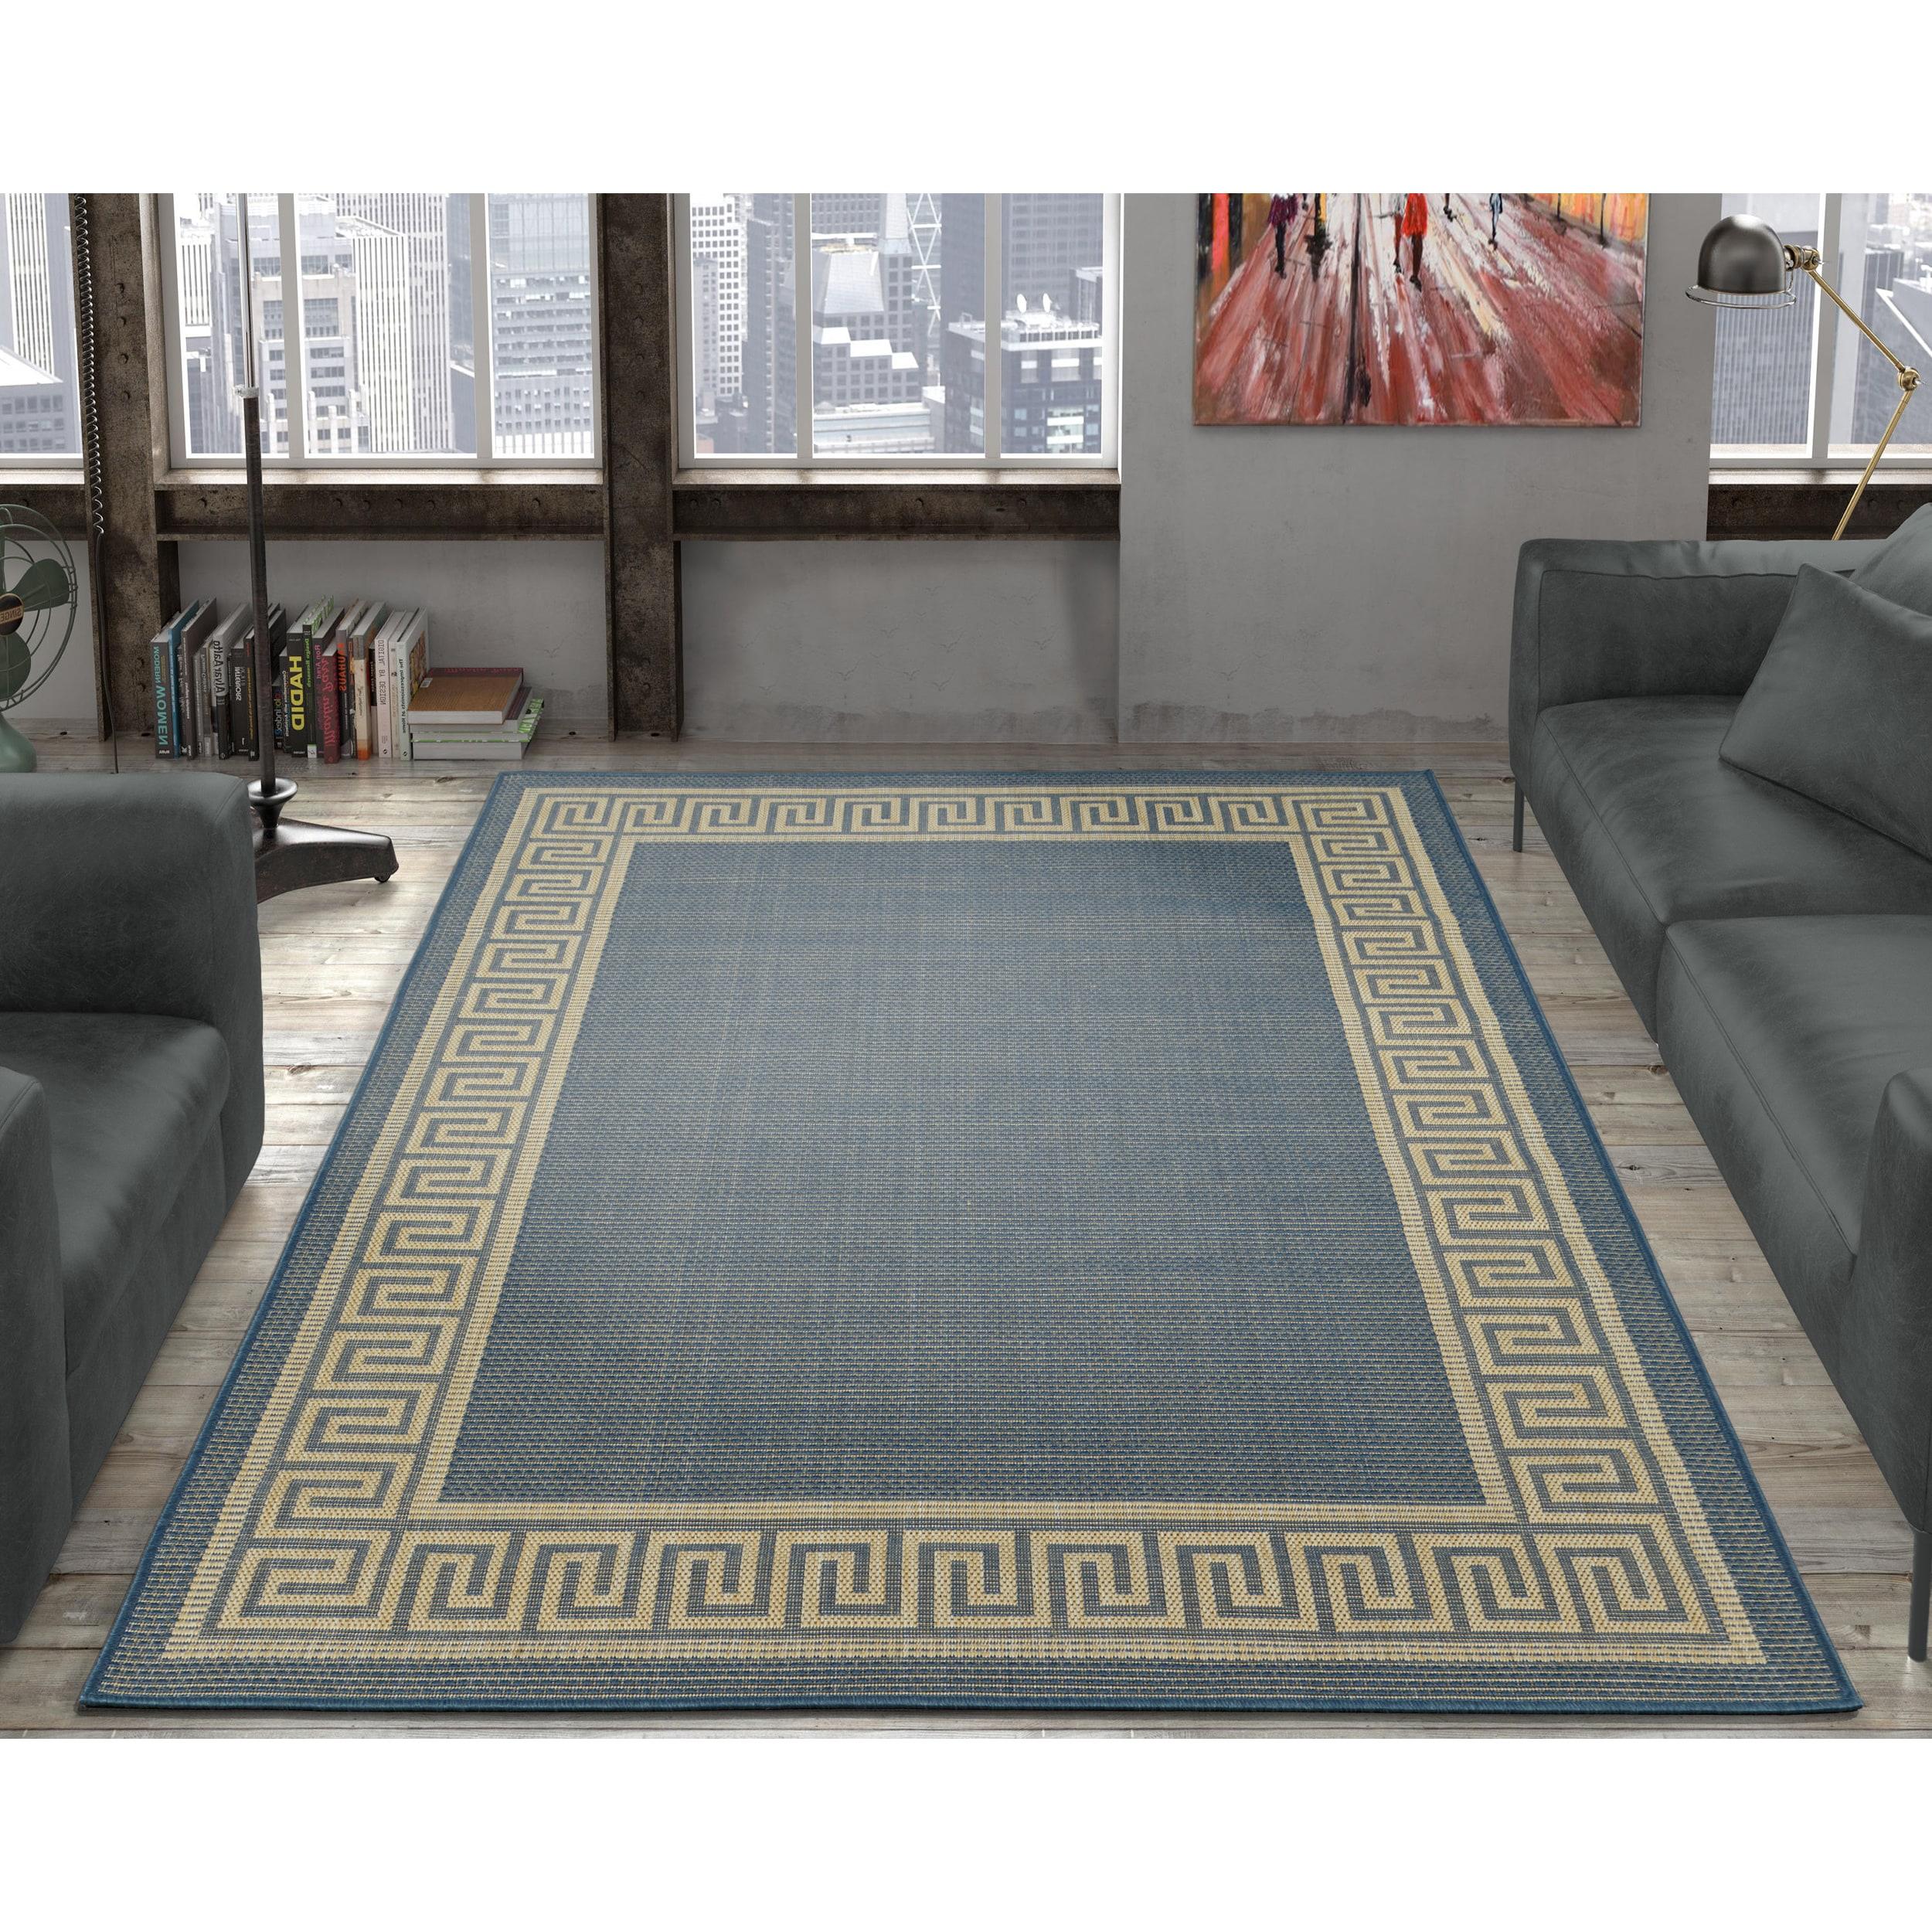 Ottomanson Jardin Collection Greek Border Design Indoor Outdoor Area Rug 5 3 X 7